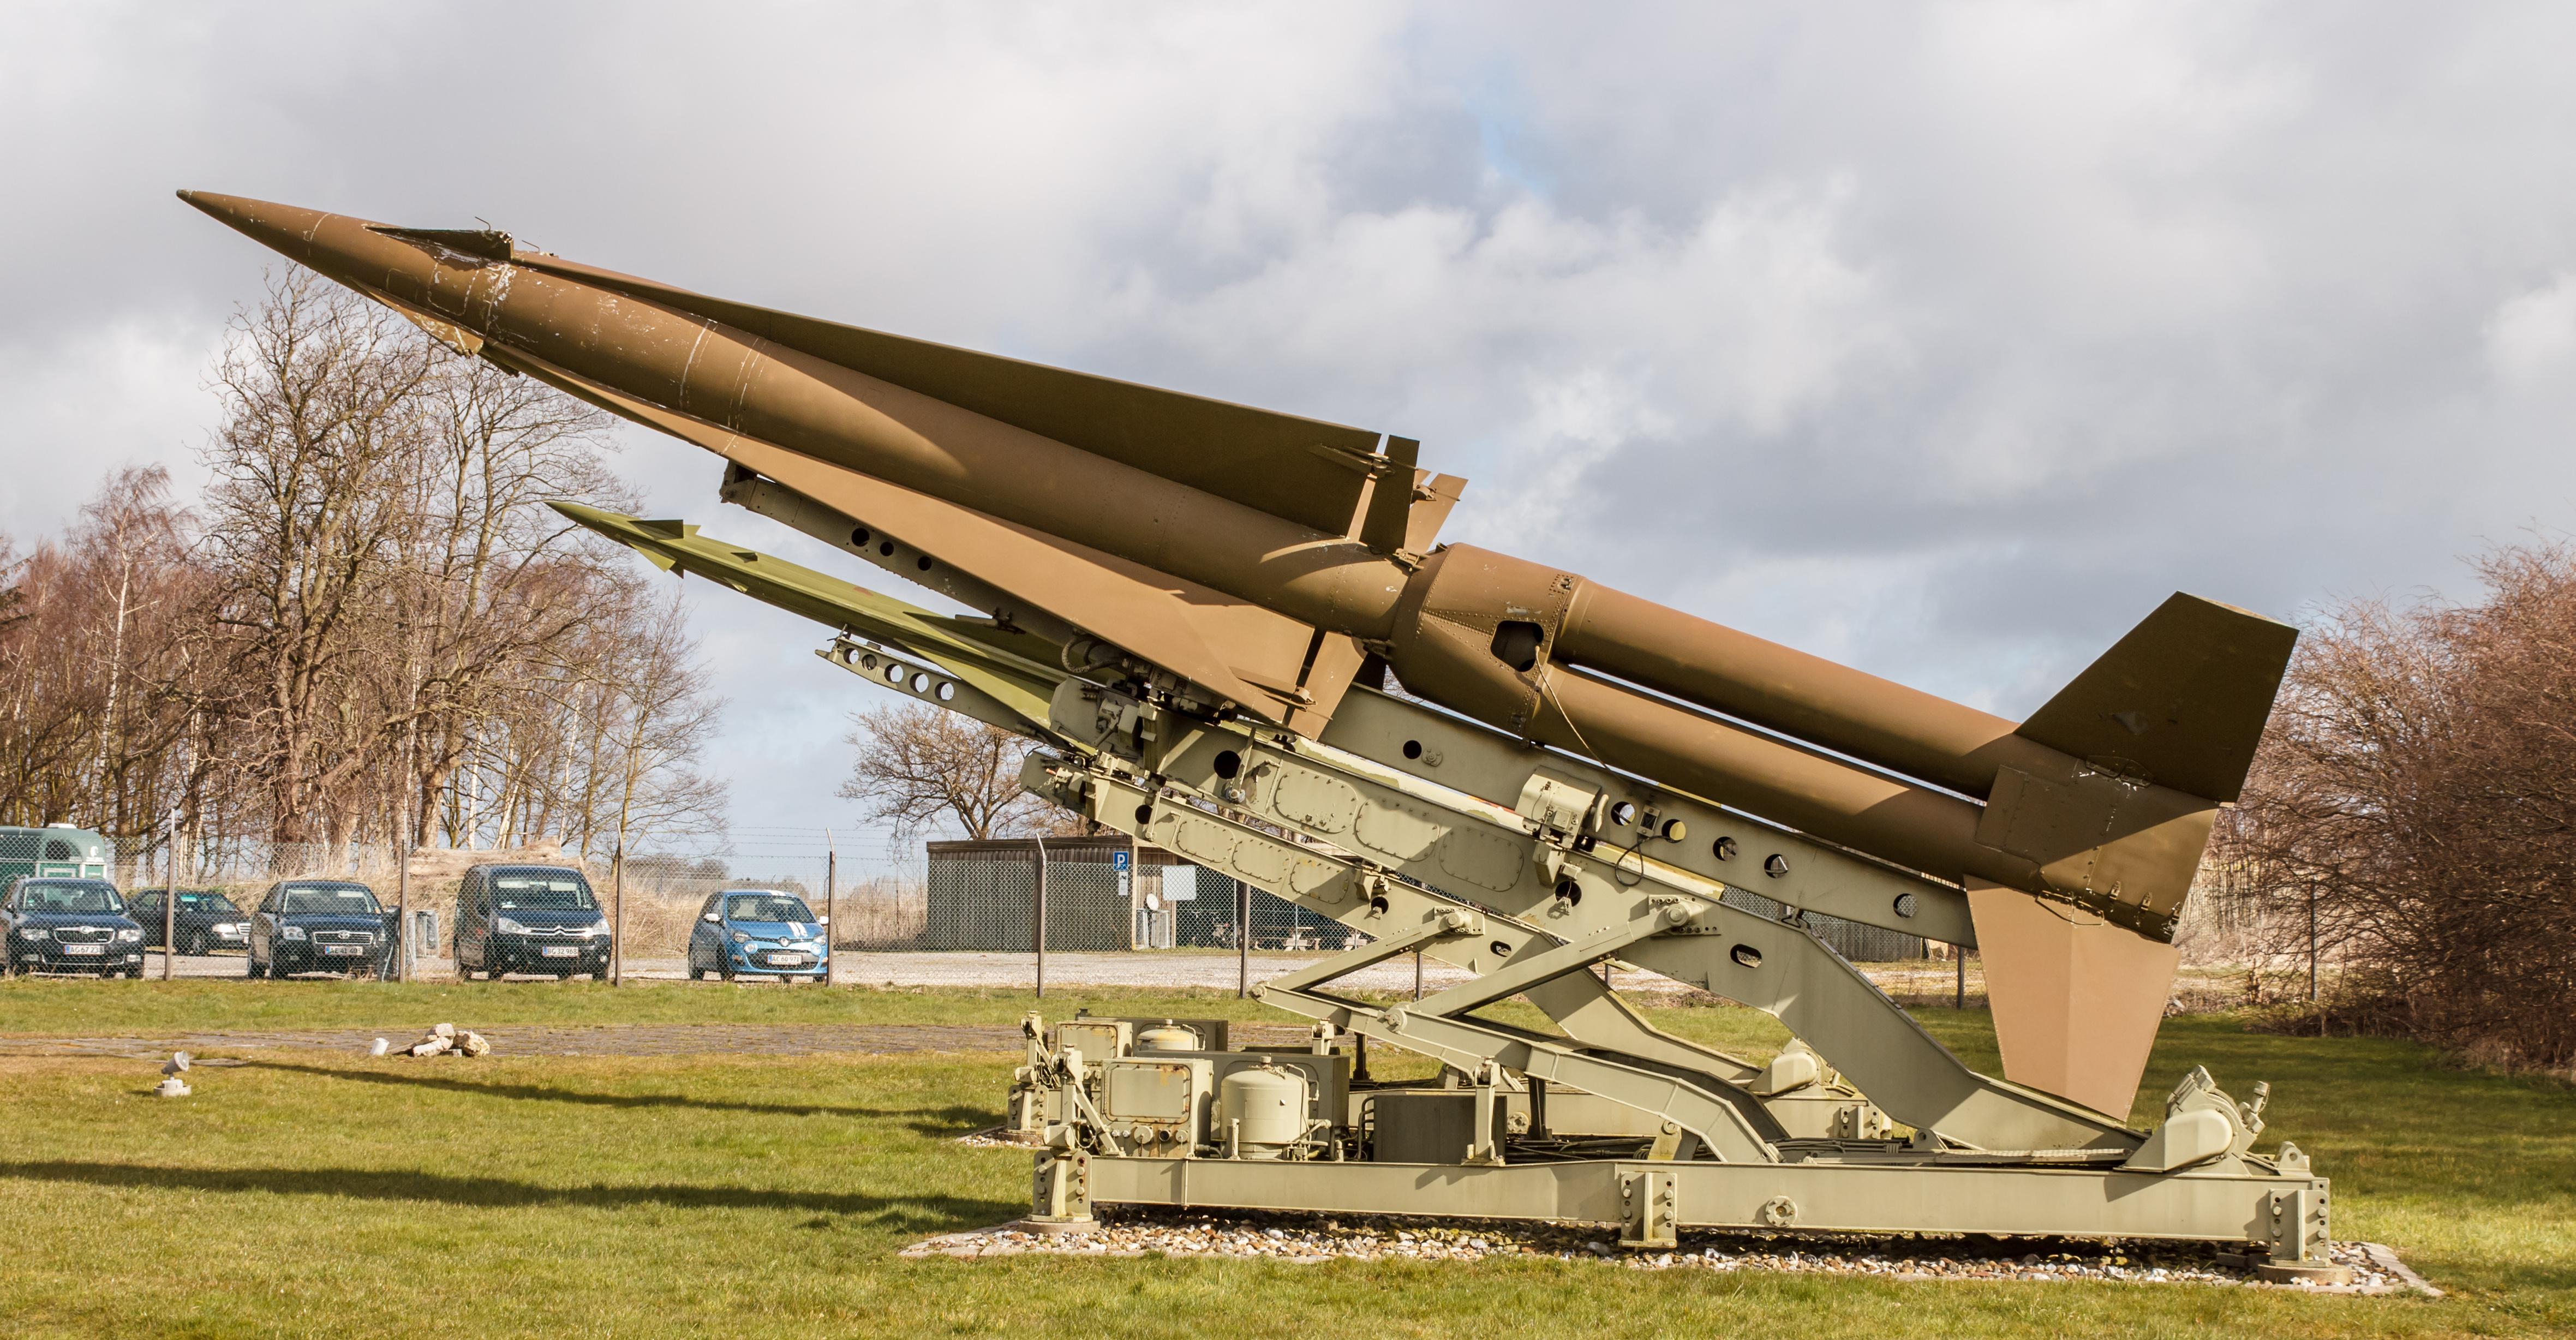 skipper Perversione Campagna  File:MIM-14 NIKE Hercules, Stevnsfort Cold War Museum, Denmark-4835.jpg -  Wikimedia Commons